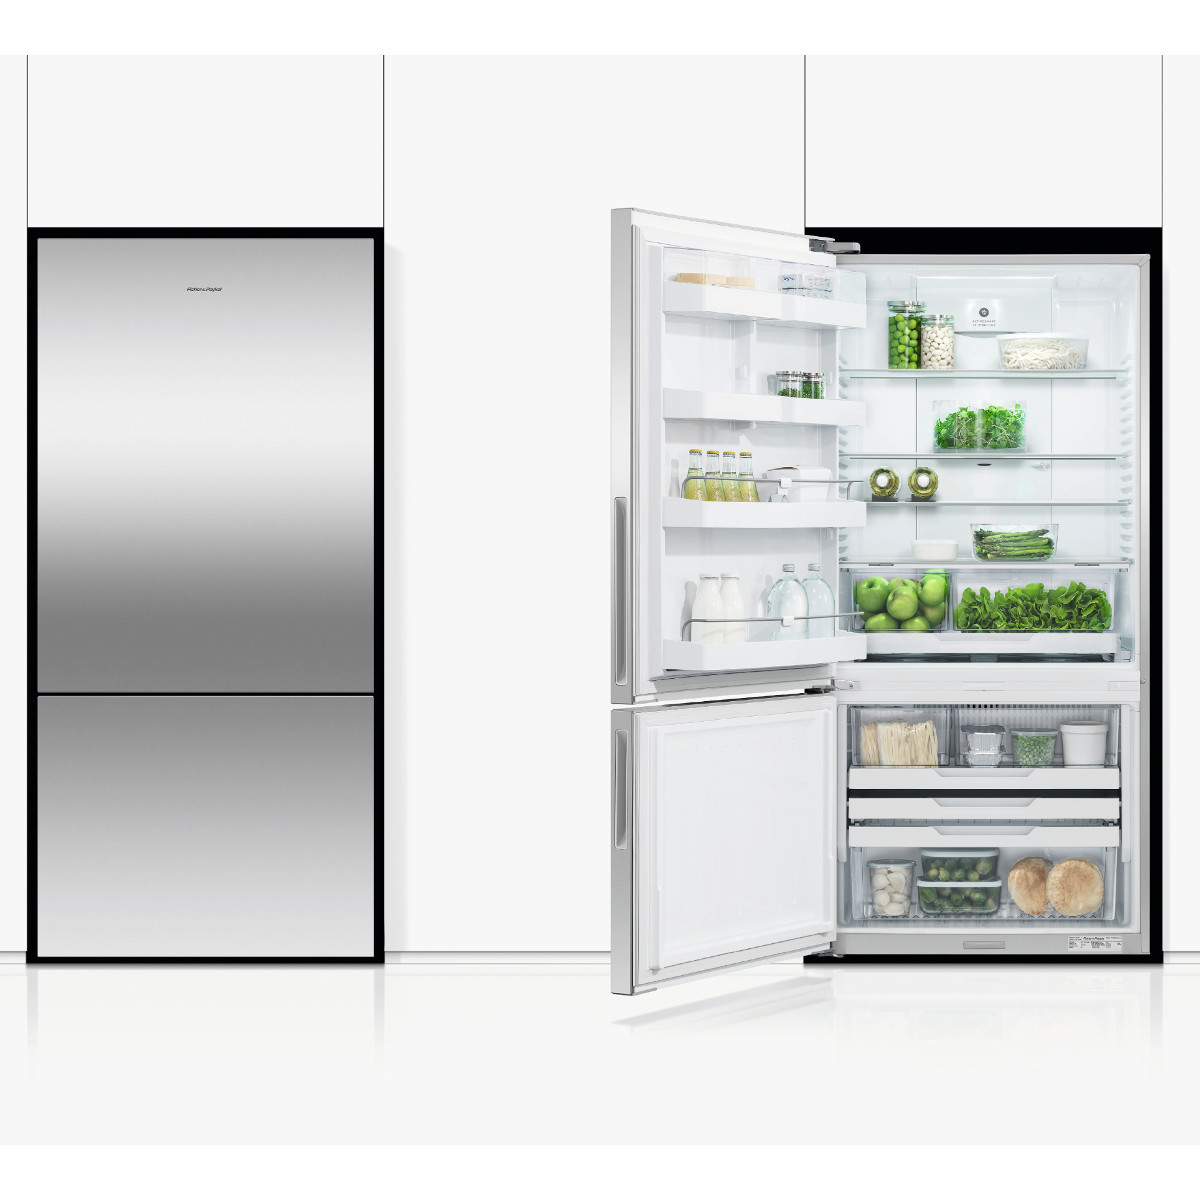 Fisher & Paykel RF522BLPX6 ActiveSmart™ Fridge Freezer Stainless ...